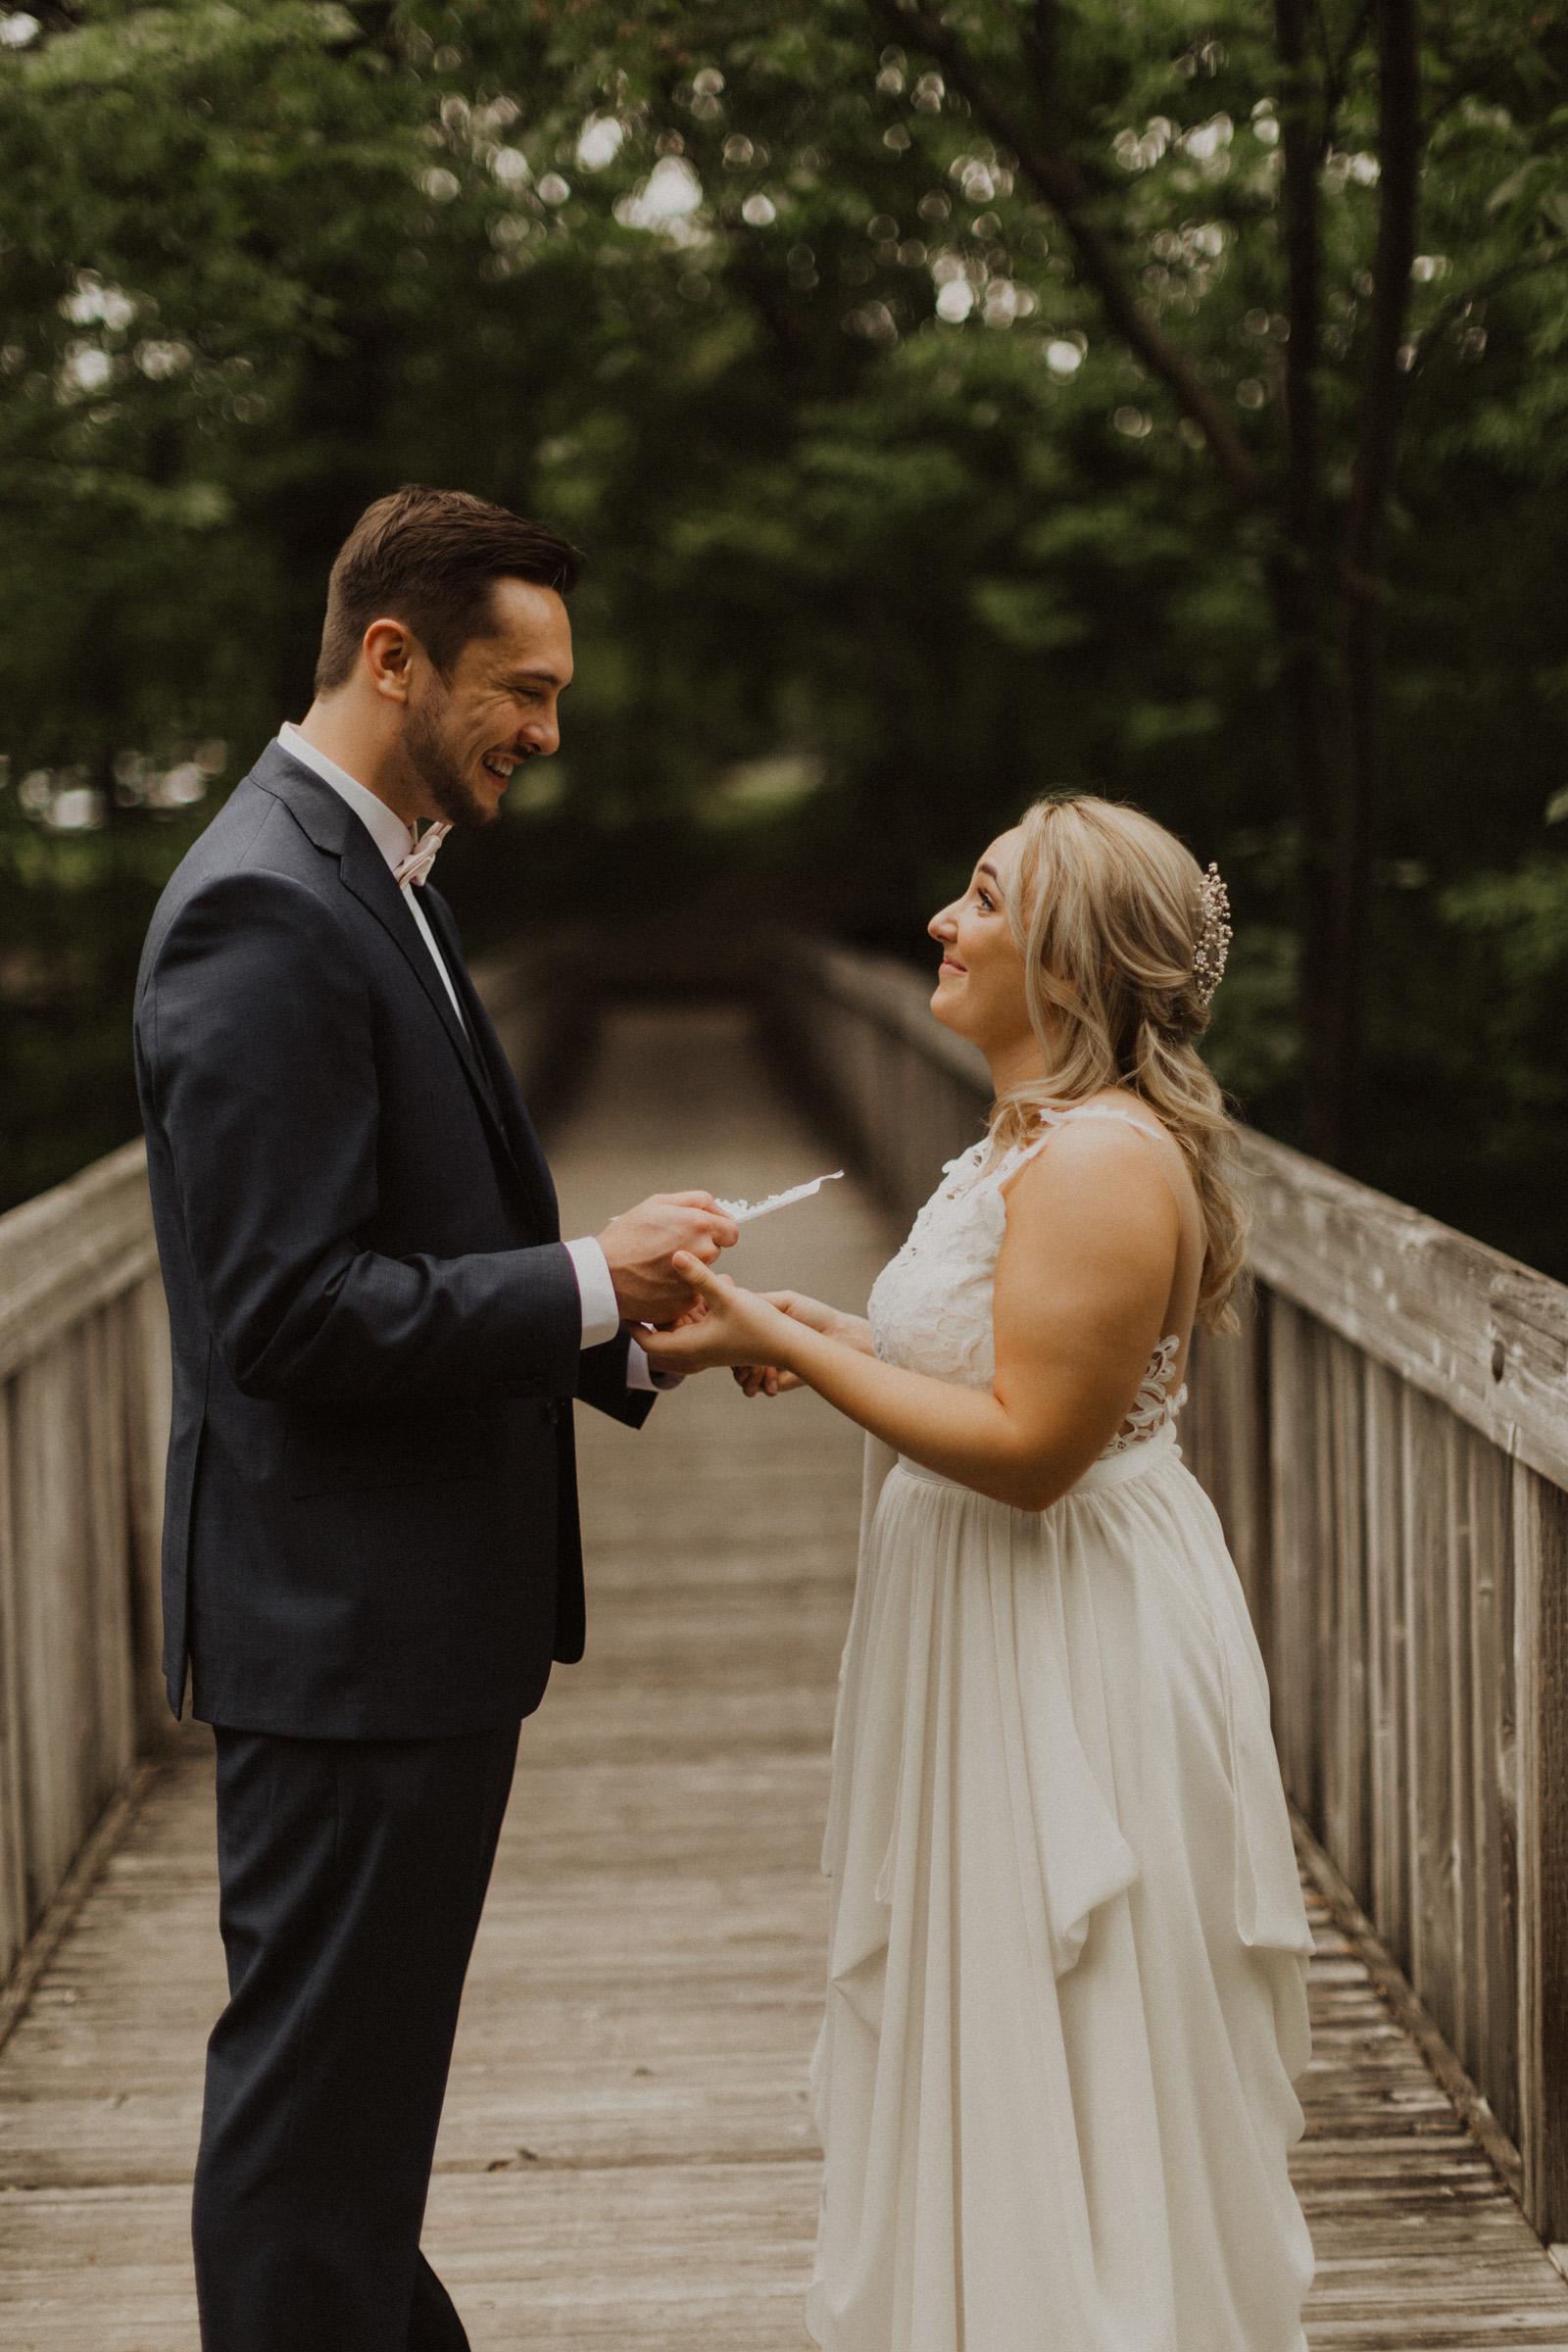 alyssa barletter photography nelson wedding nebraska city lied lodge morton barn spring wedding photographer-10.jpg